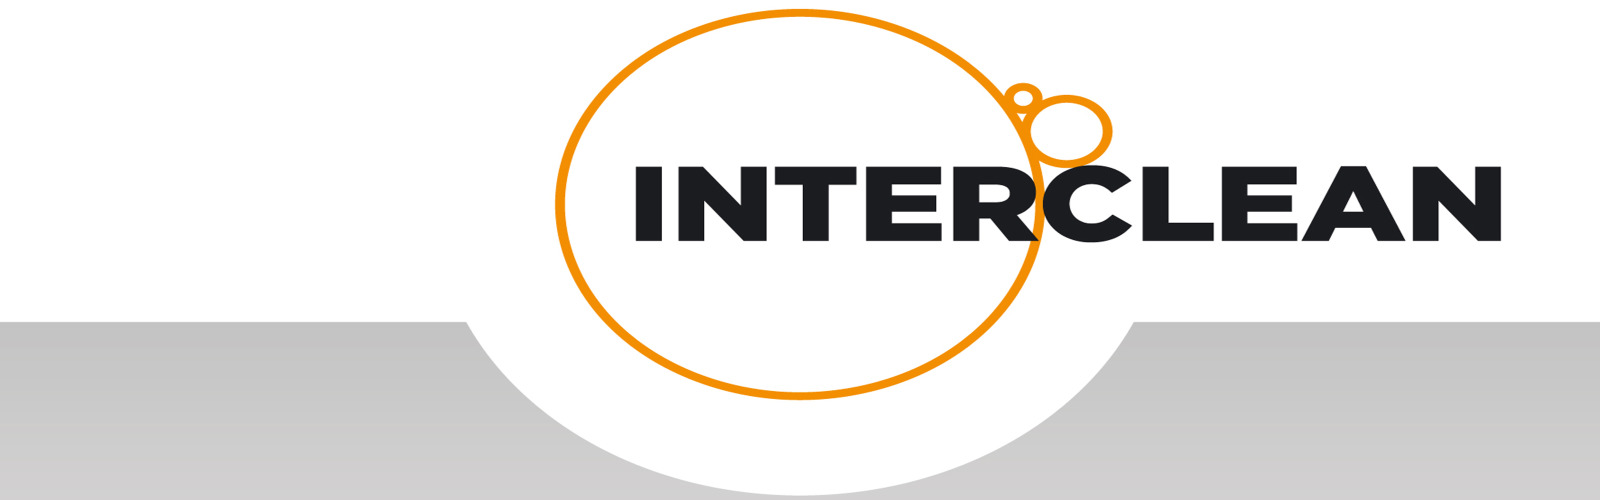 IntercleanCategoryAwardLogo_original.jpg